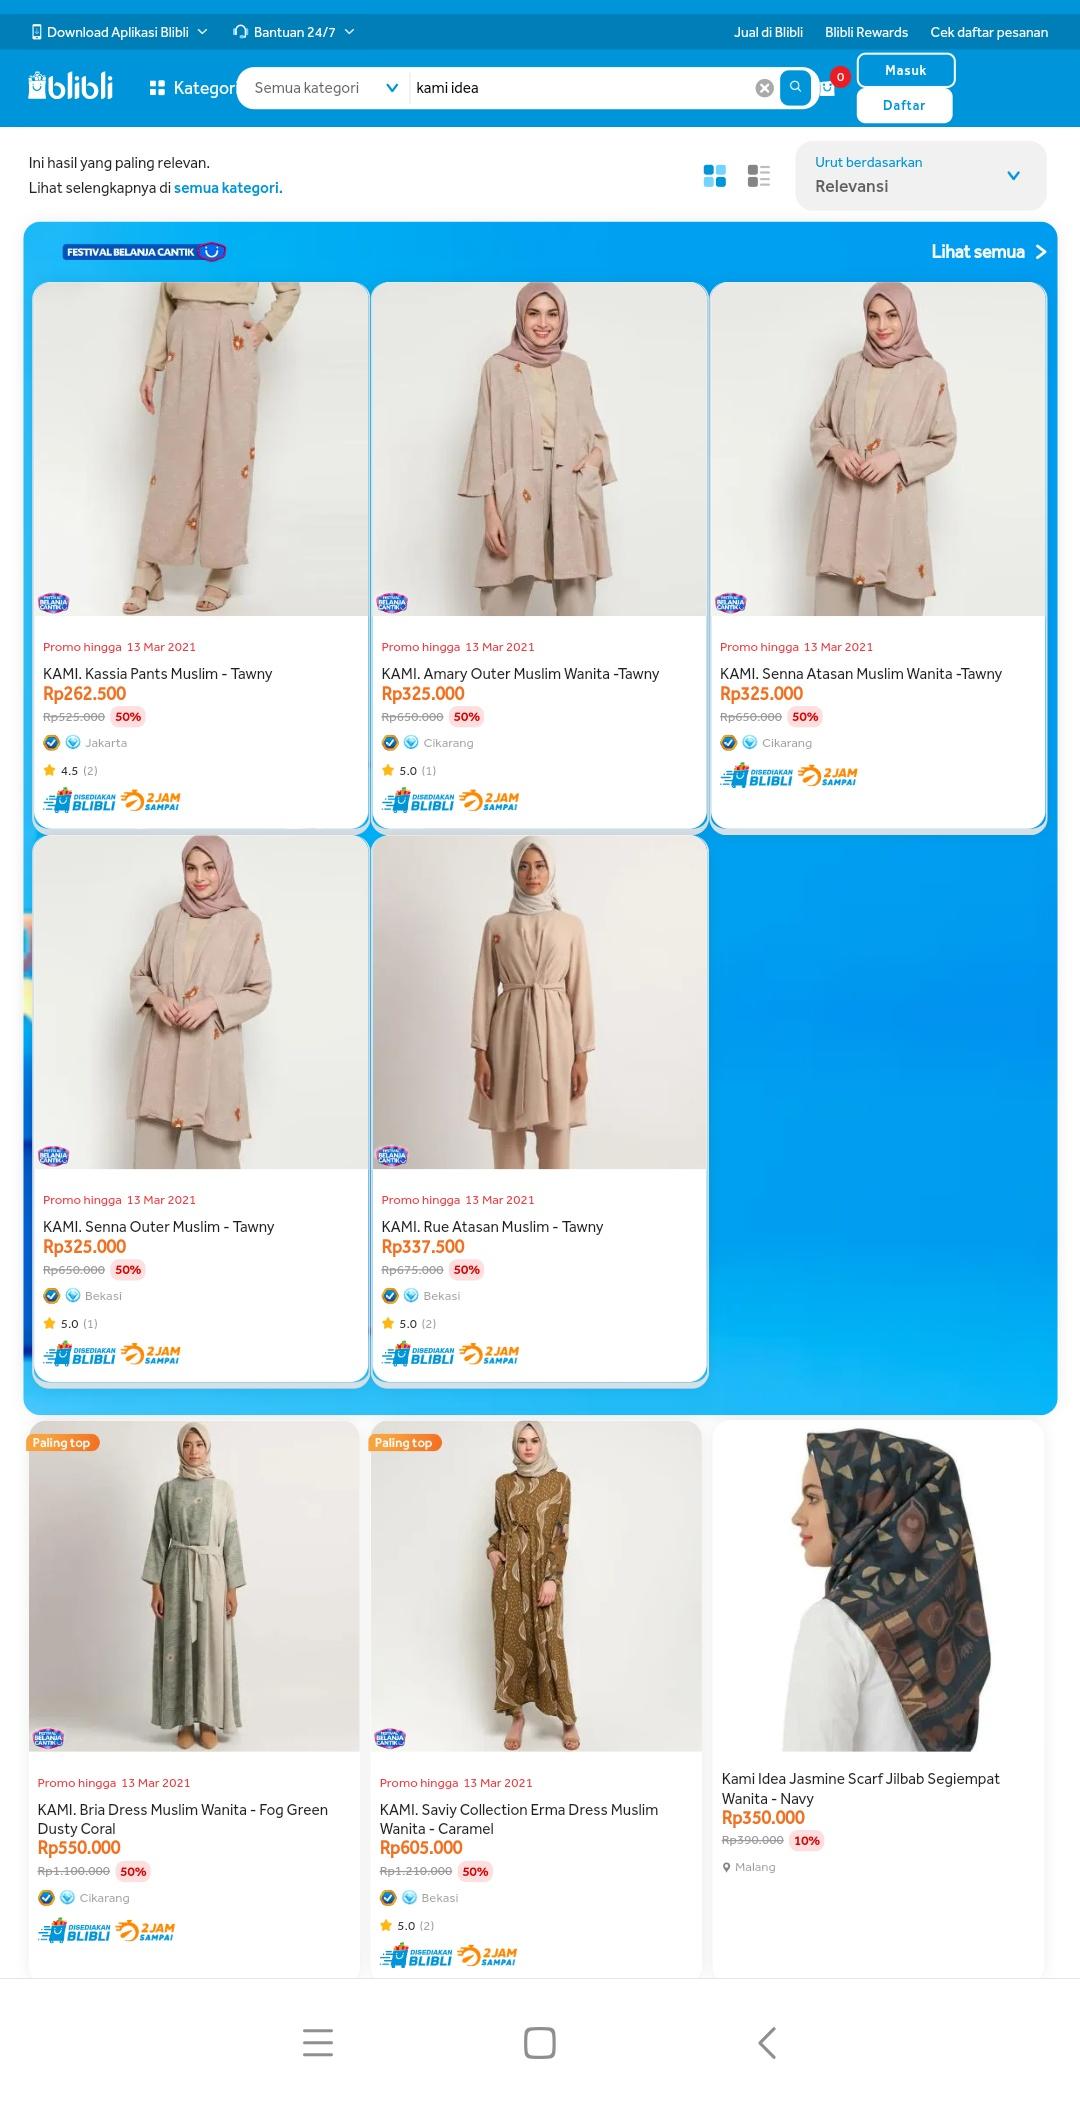 Koleksi fashion Kamiidea di Blibli